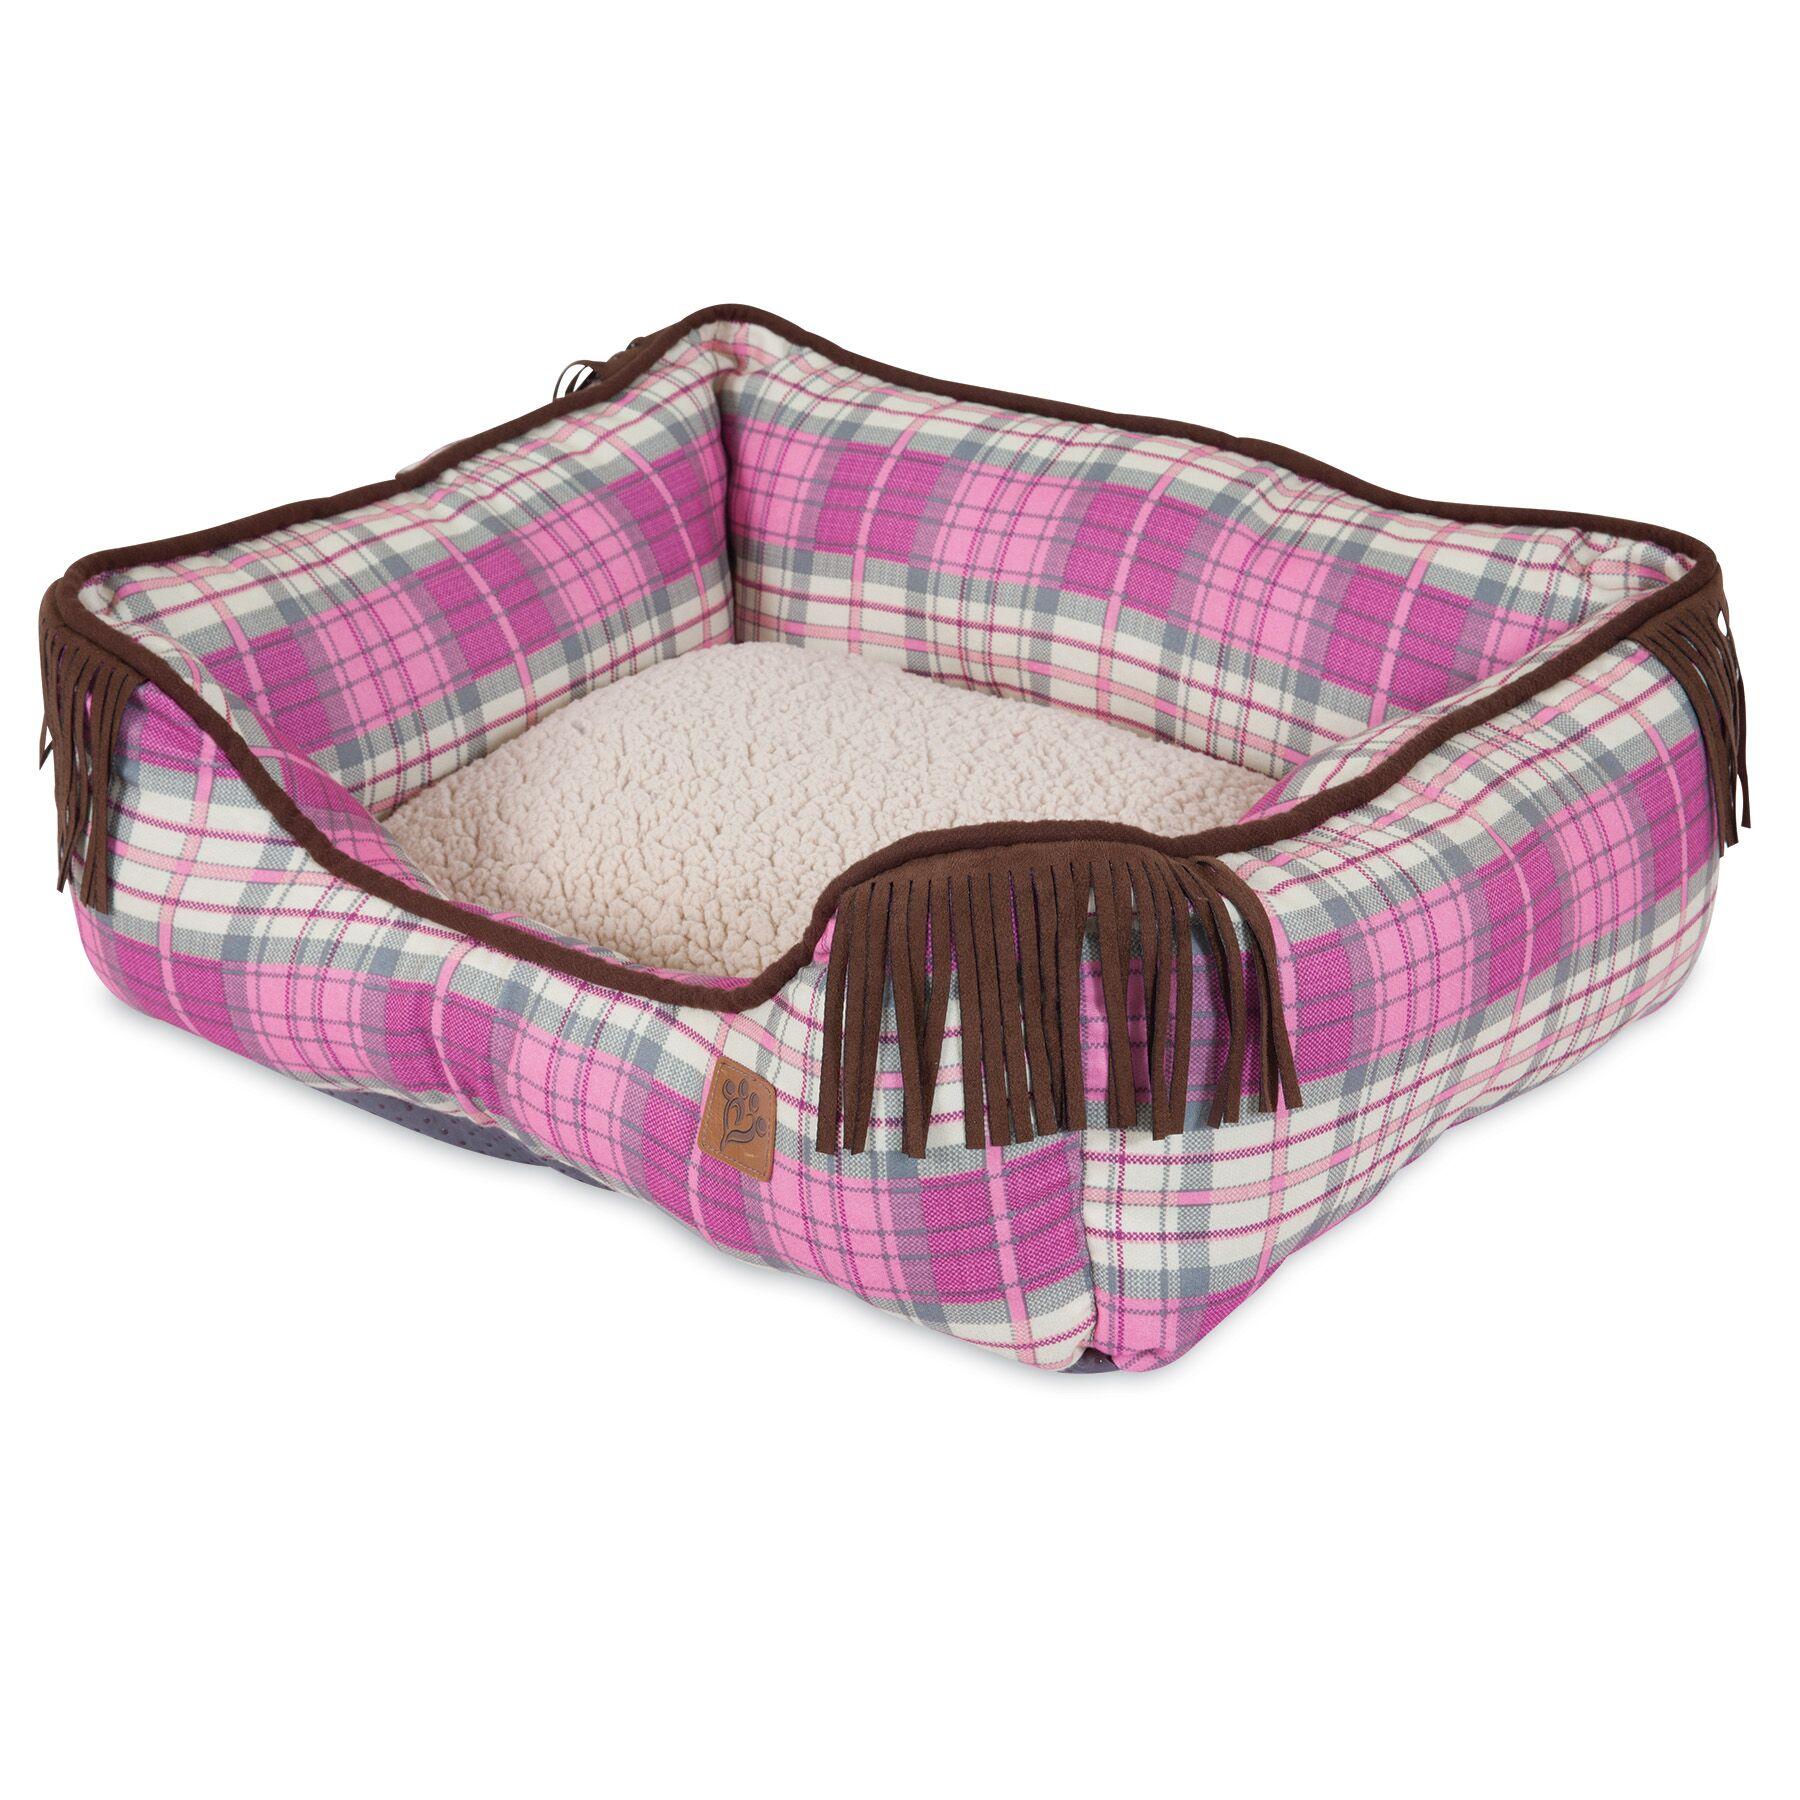 Lambswool Corner Fringe Printed Lounger Bolster Dog Bed